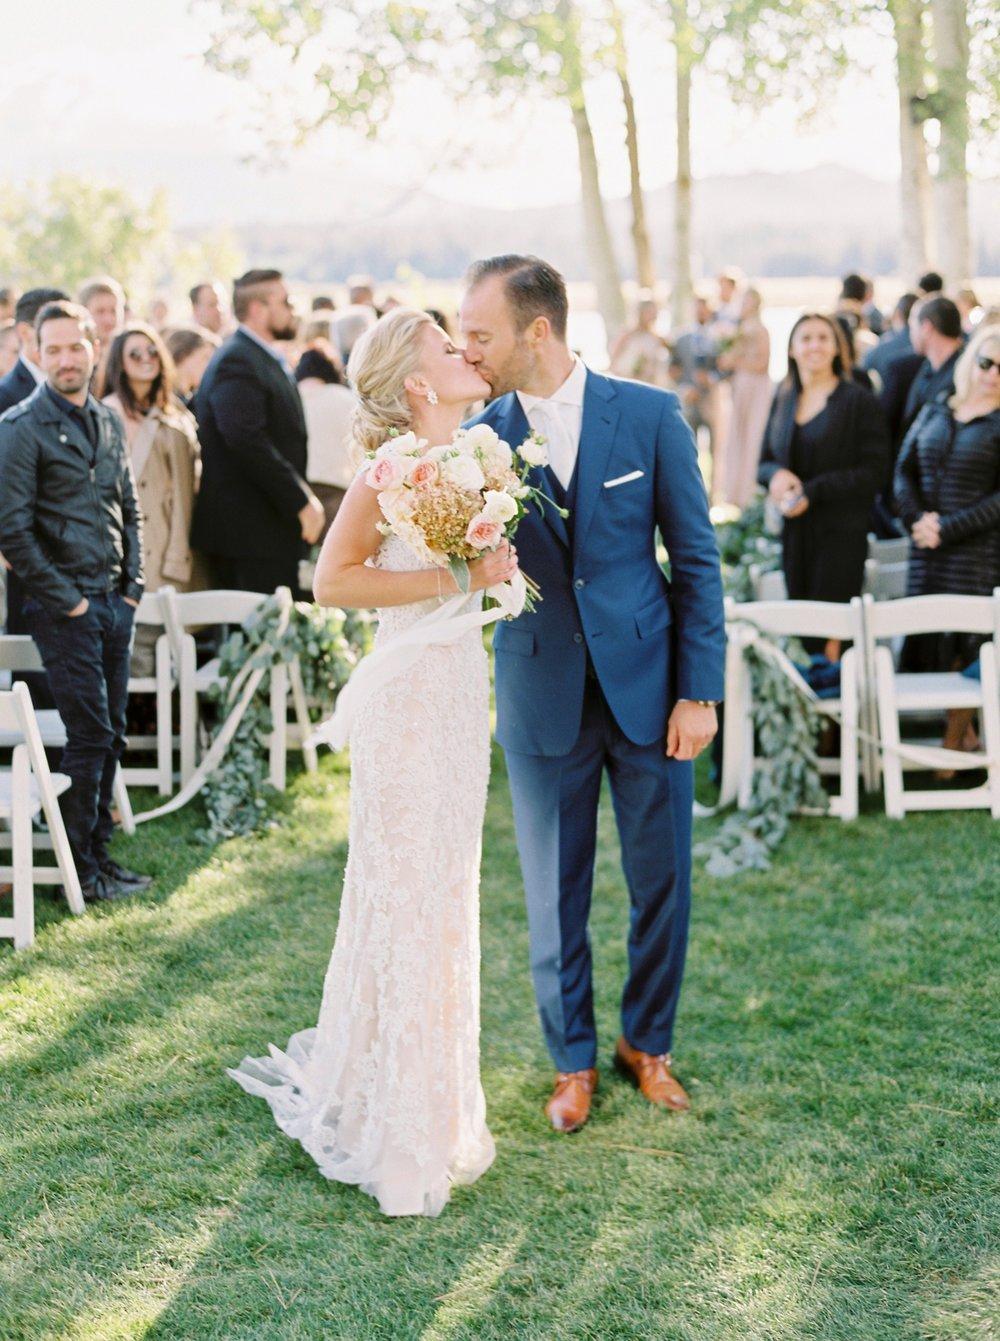 Calgary wedding photographers | oregon wedding photographers | fine art film | Justine Milton Photography | oregon wedding | wedding ceremony | bride and groom | just married